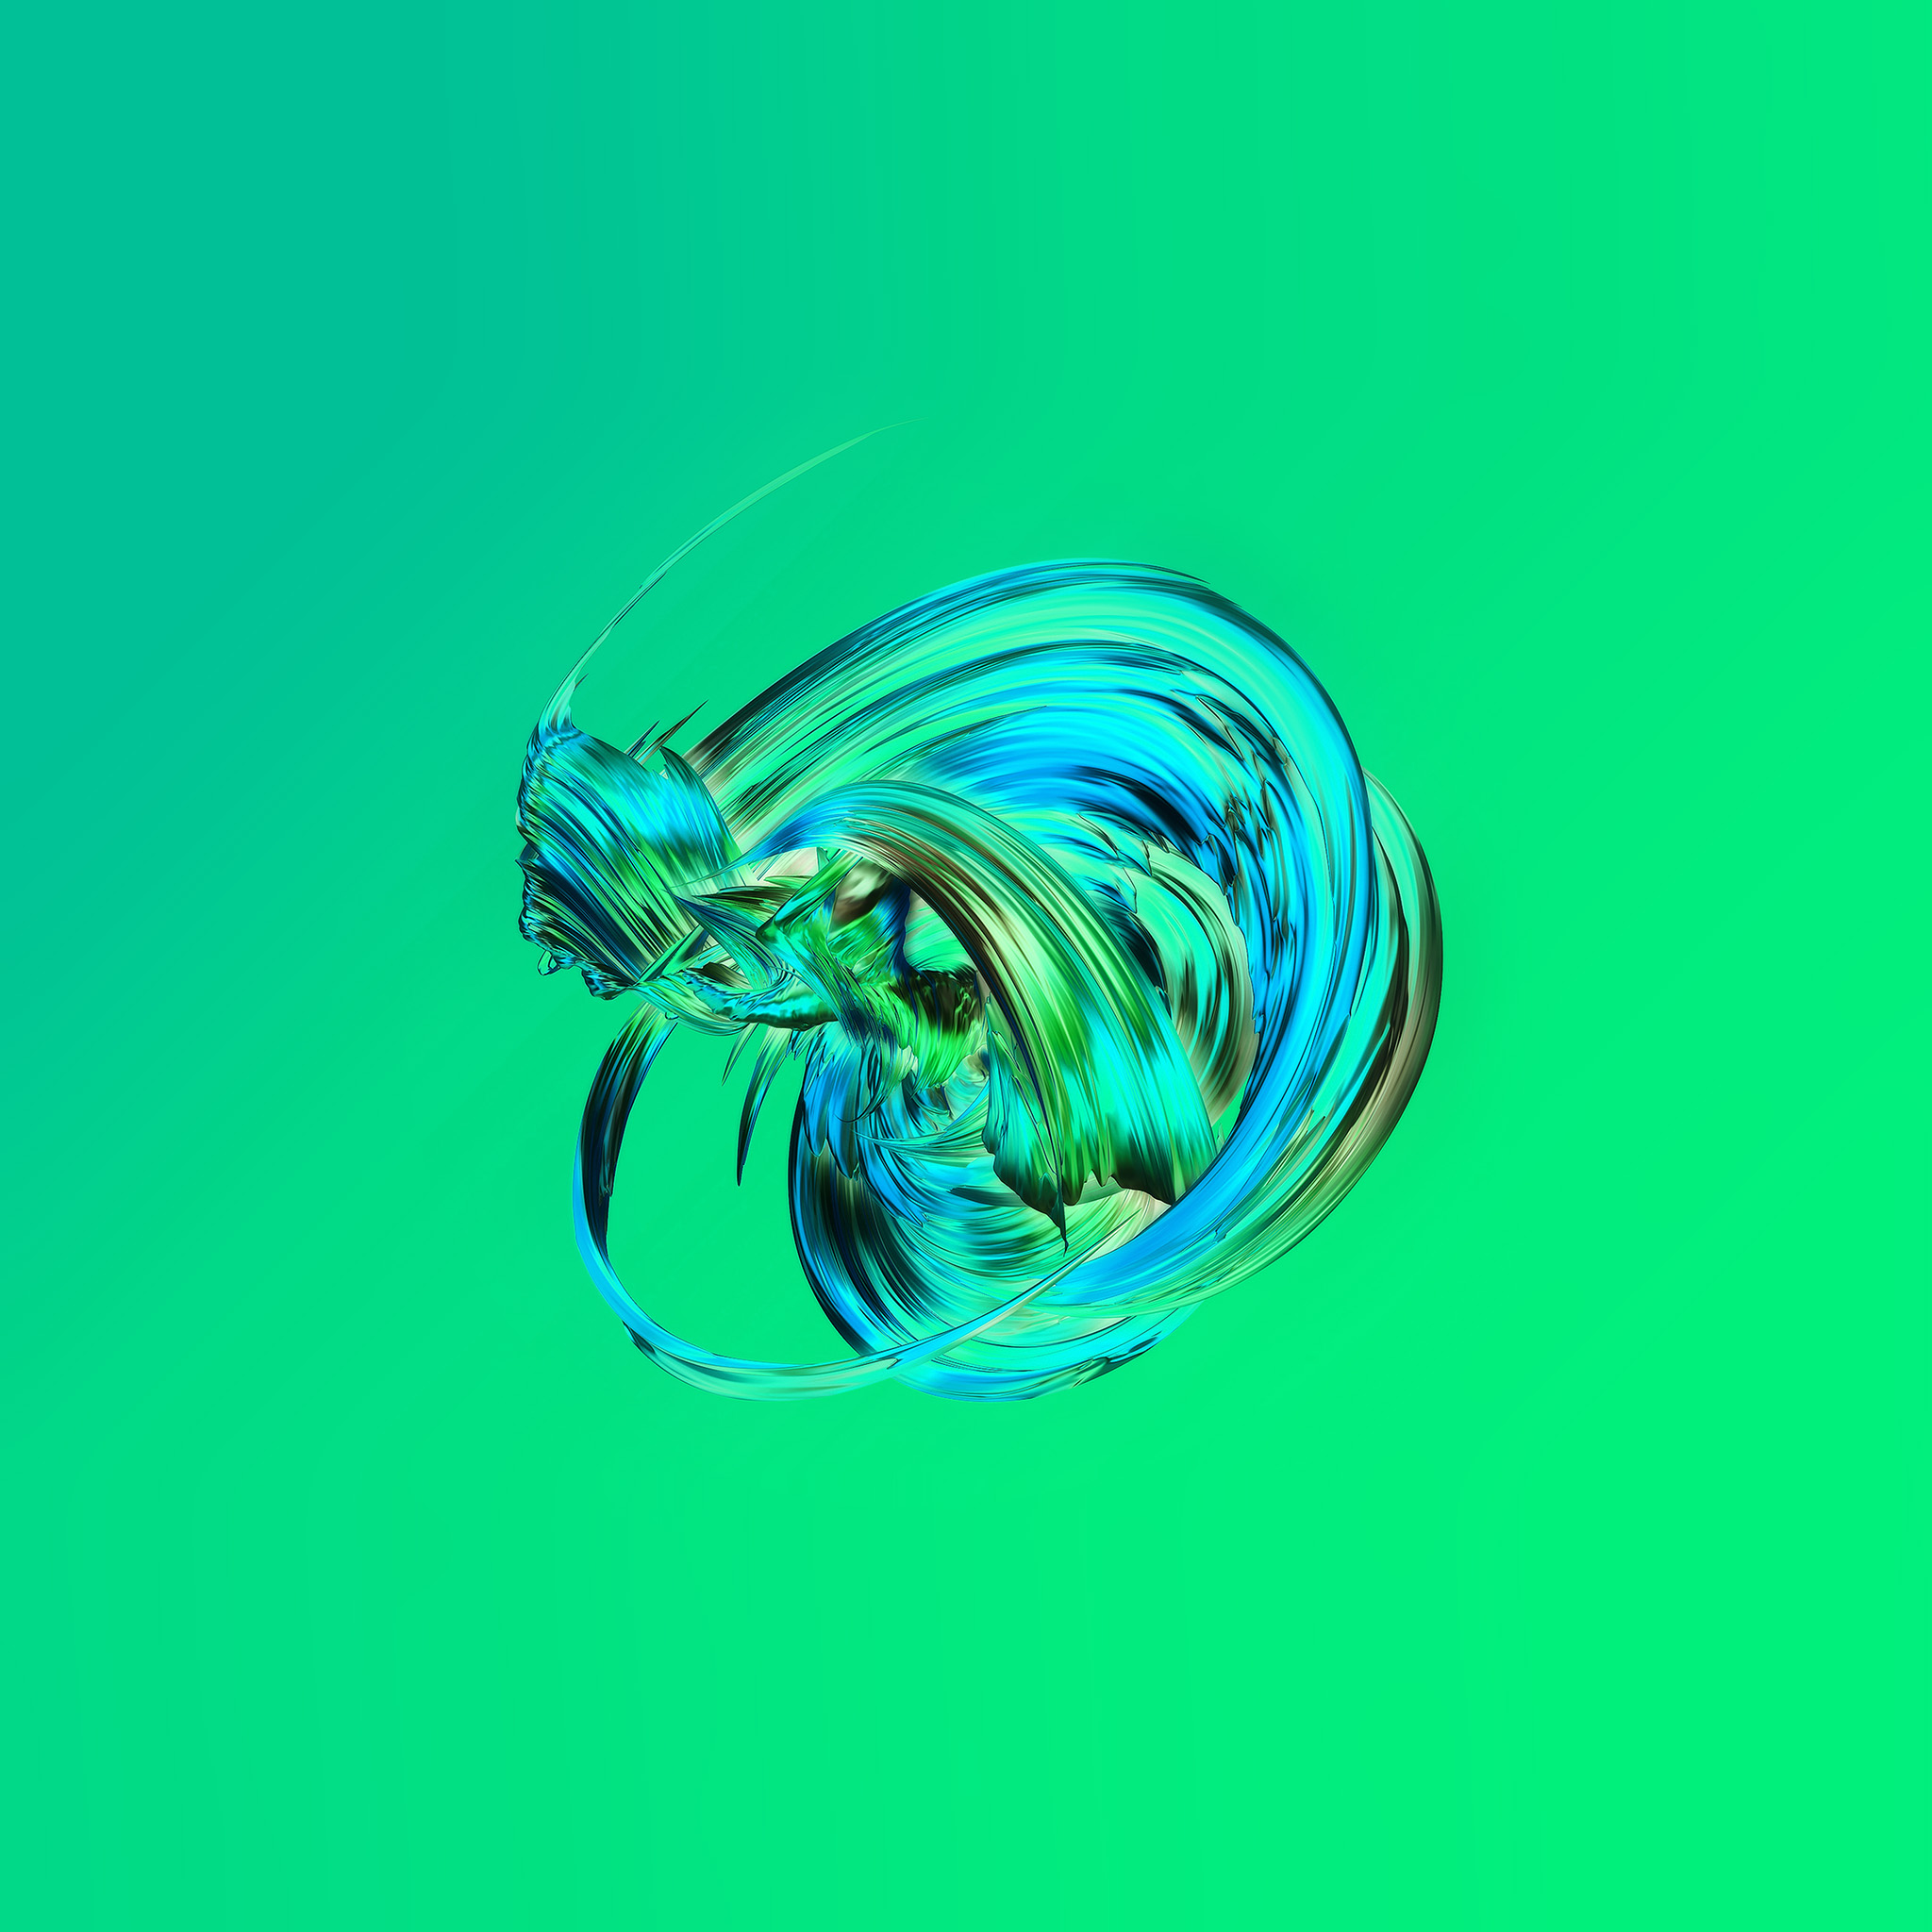 Vw21-green-art-circle